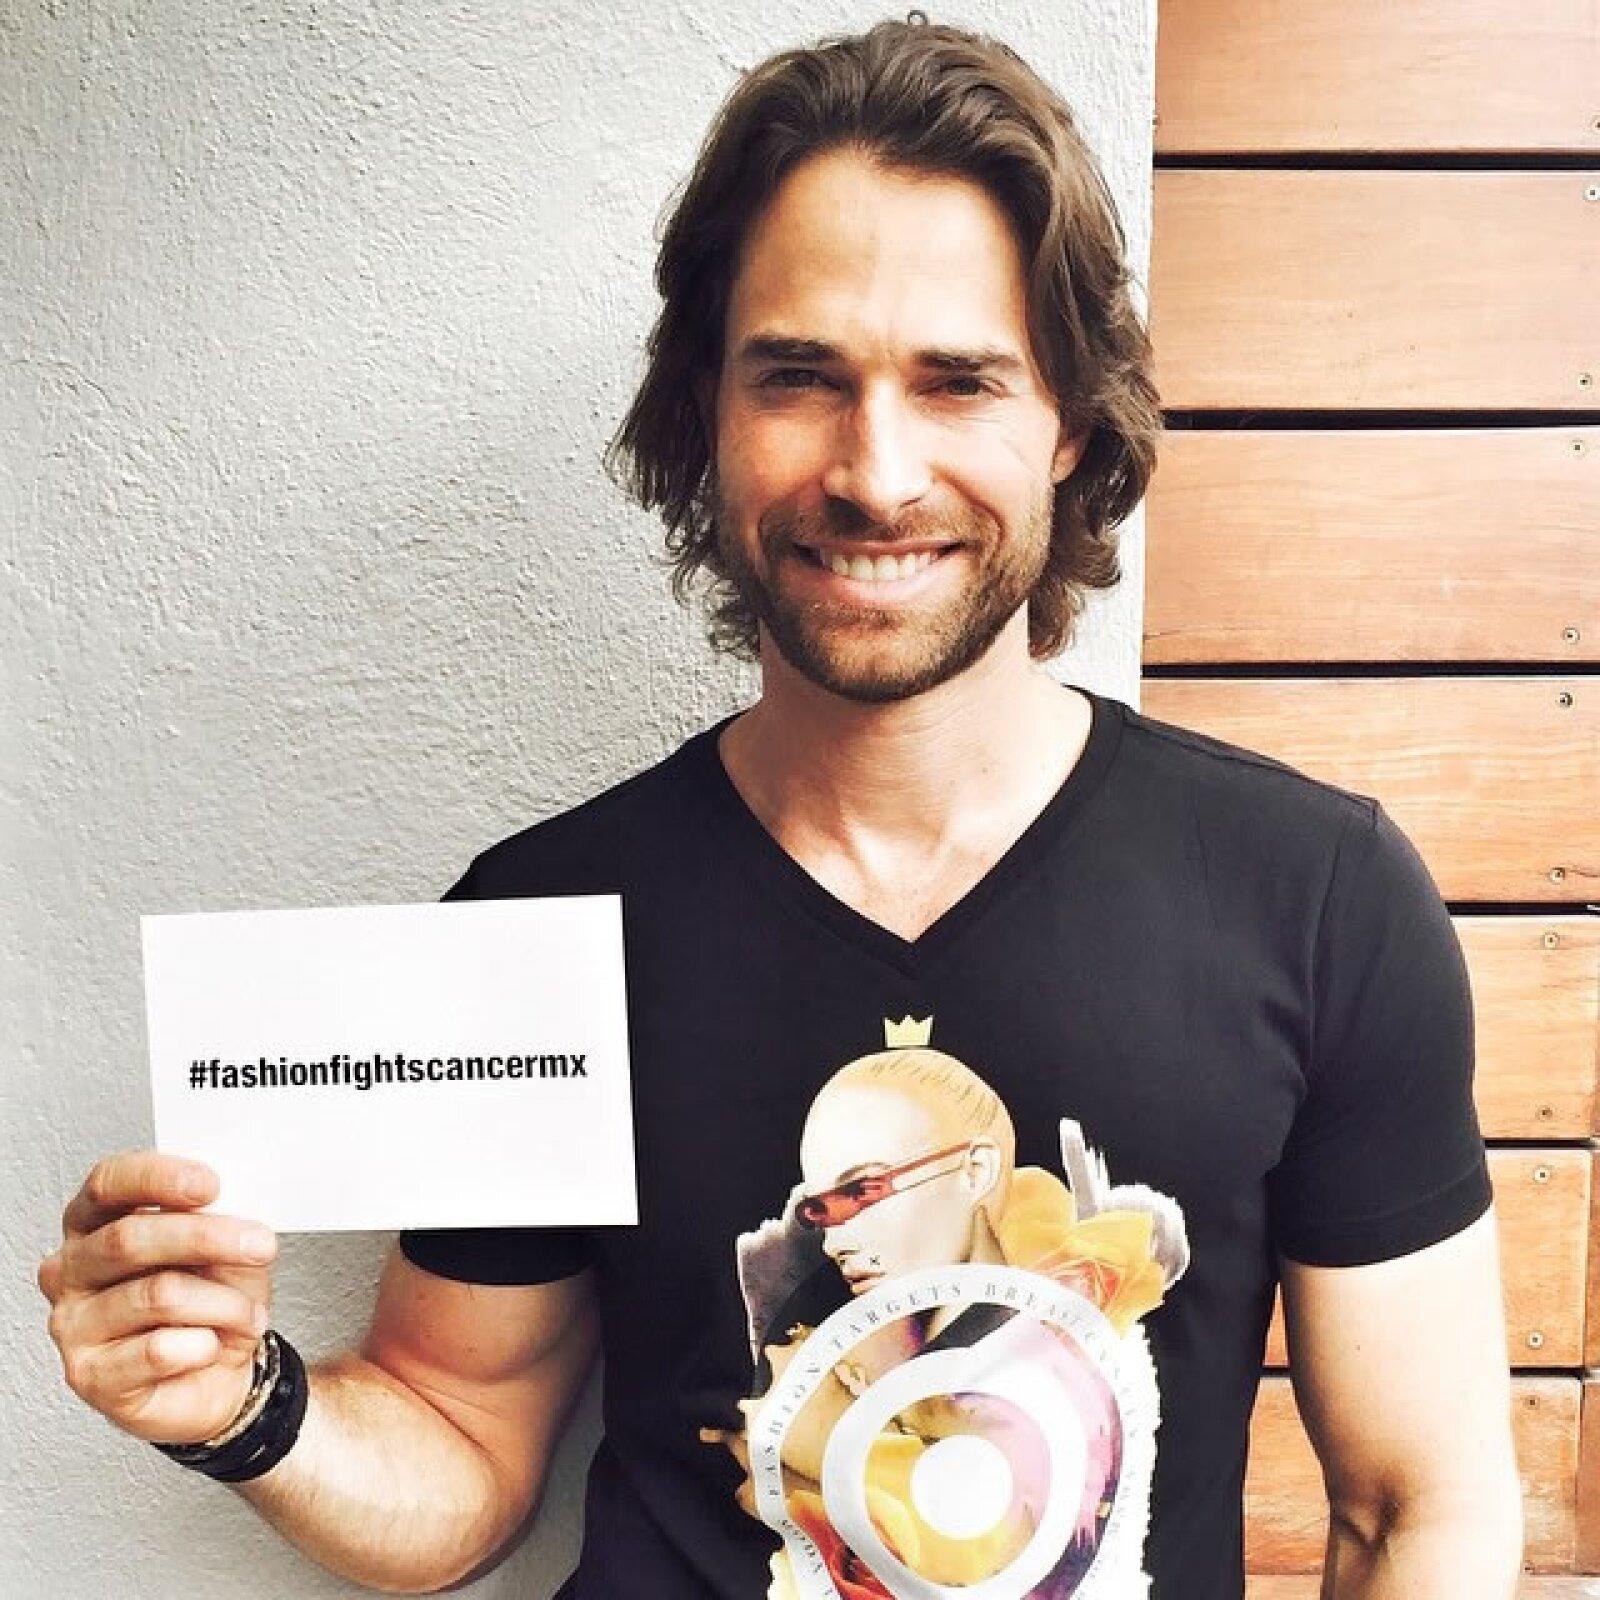 Sebastián Rulli: `Apoyando con mucho amor esta noble causa #fashionfightscancermx´.